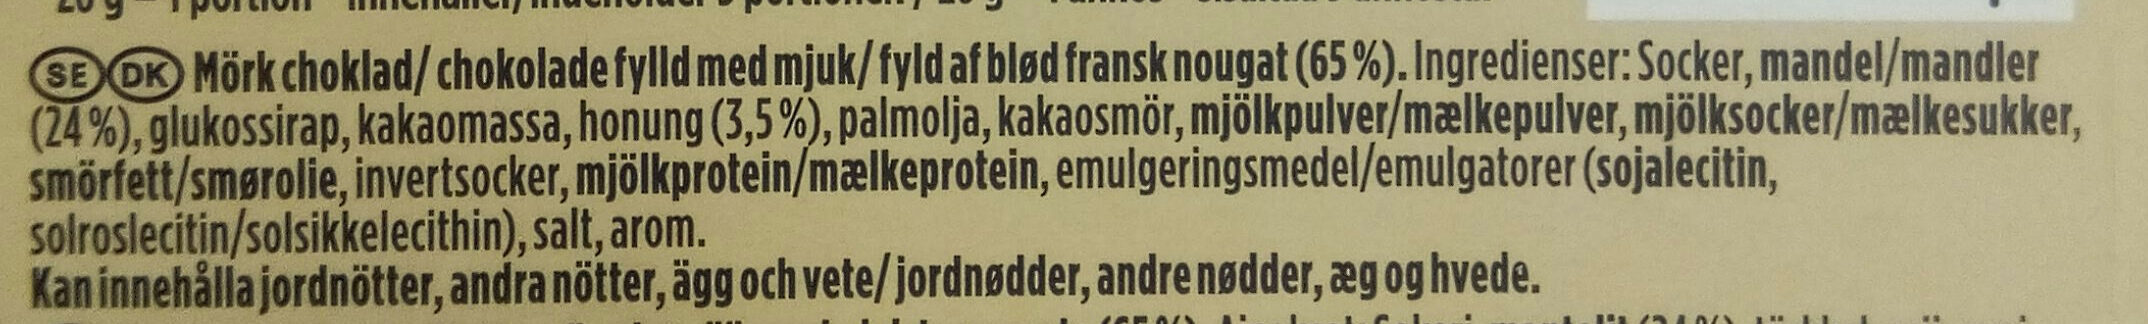 Fylld fransk nougat - Ingredients